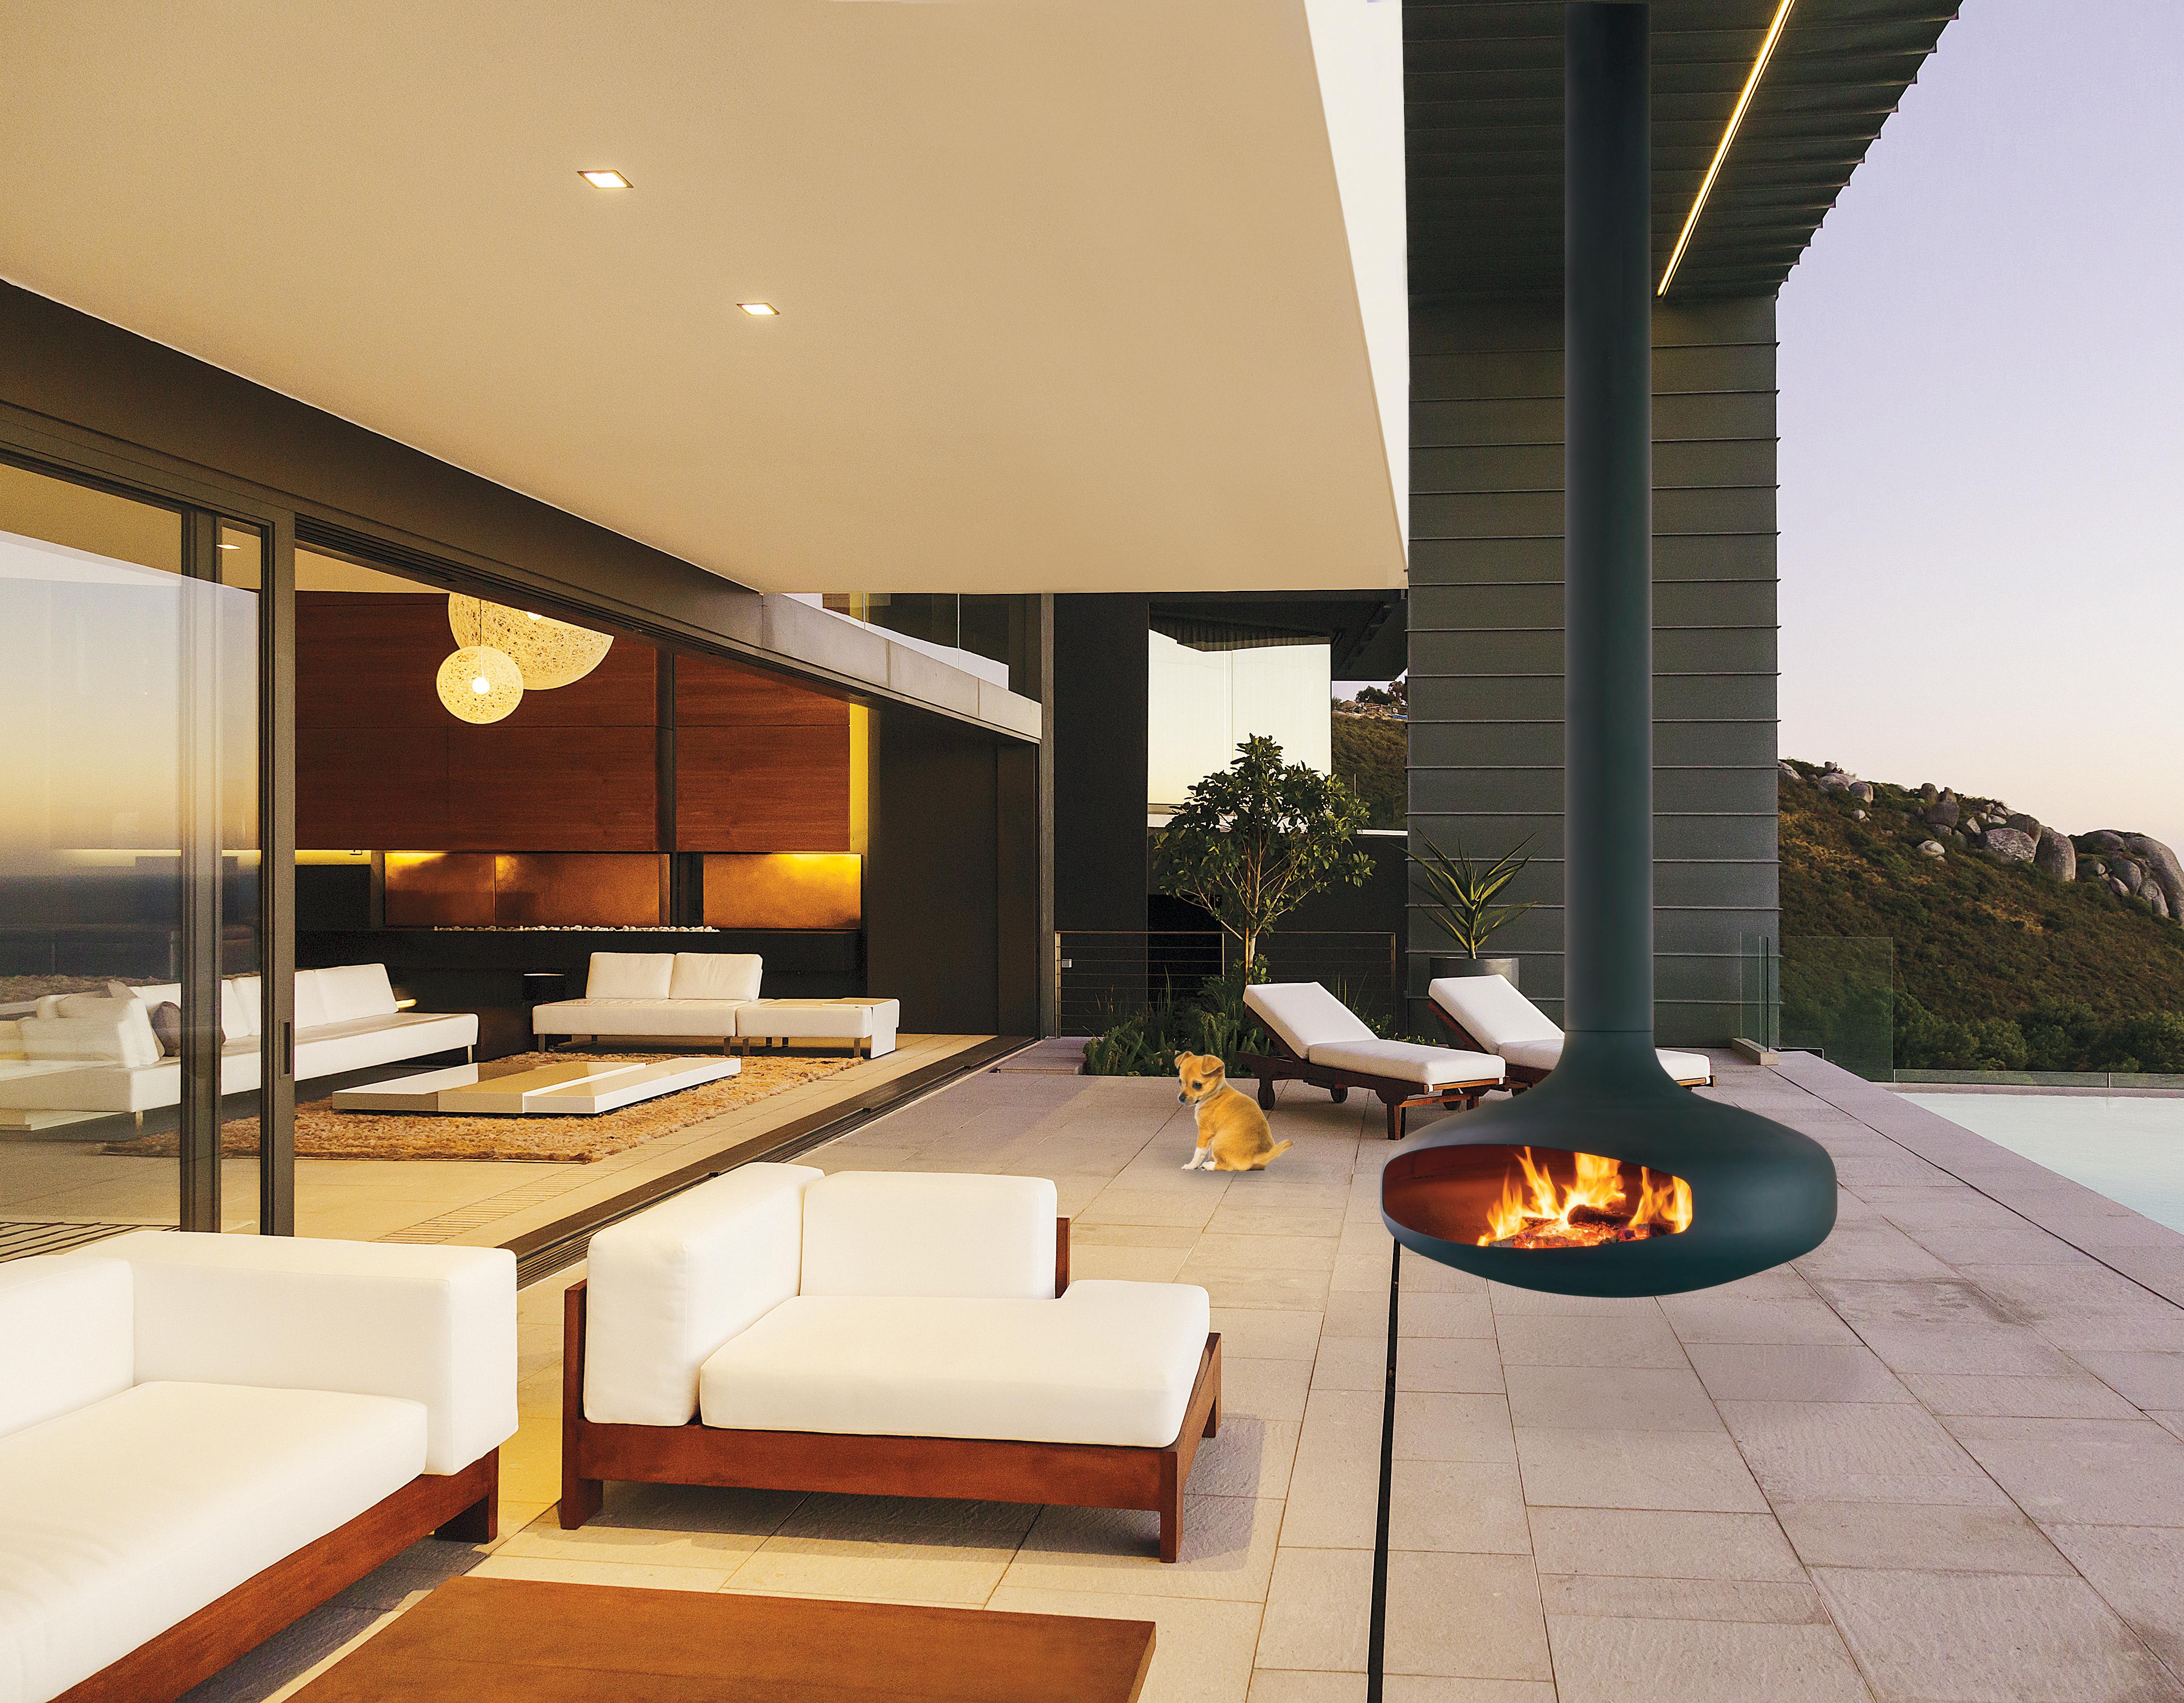 chimenea design de exterior, Domofcus outdoor